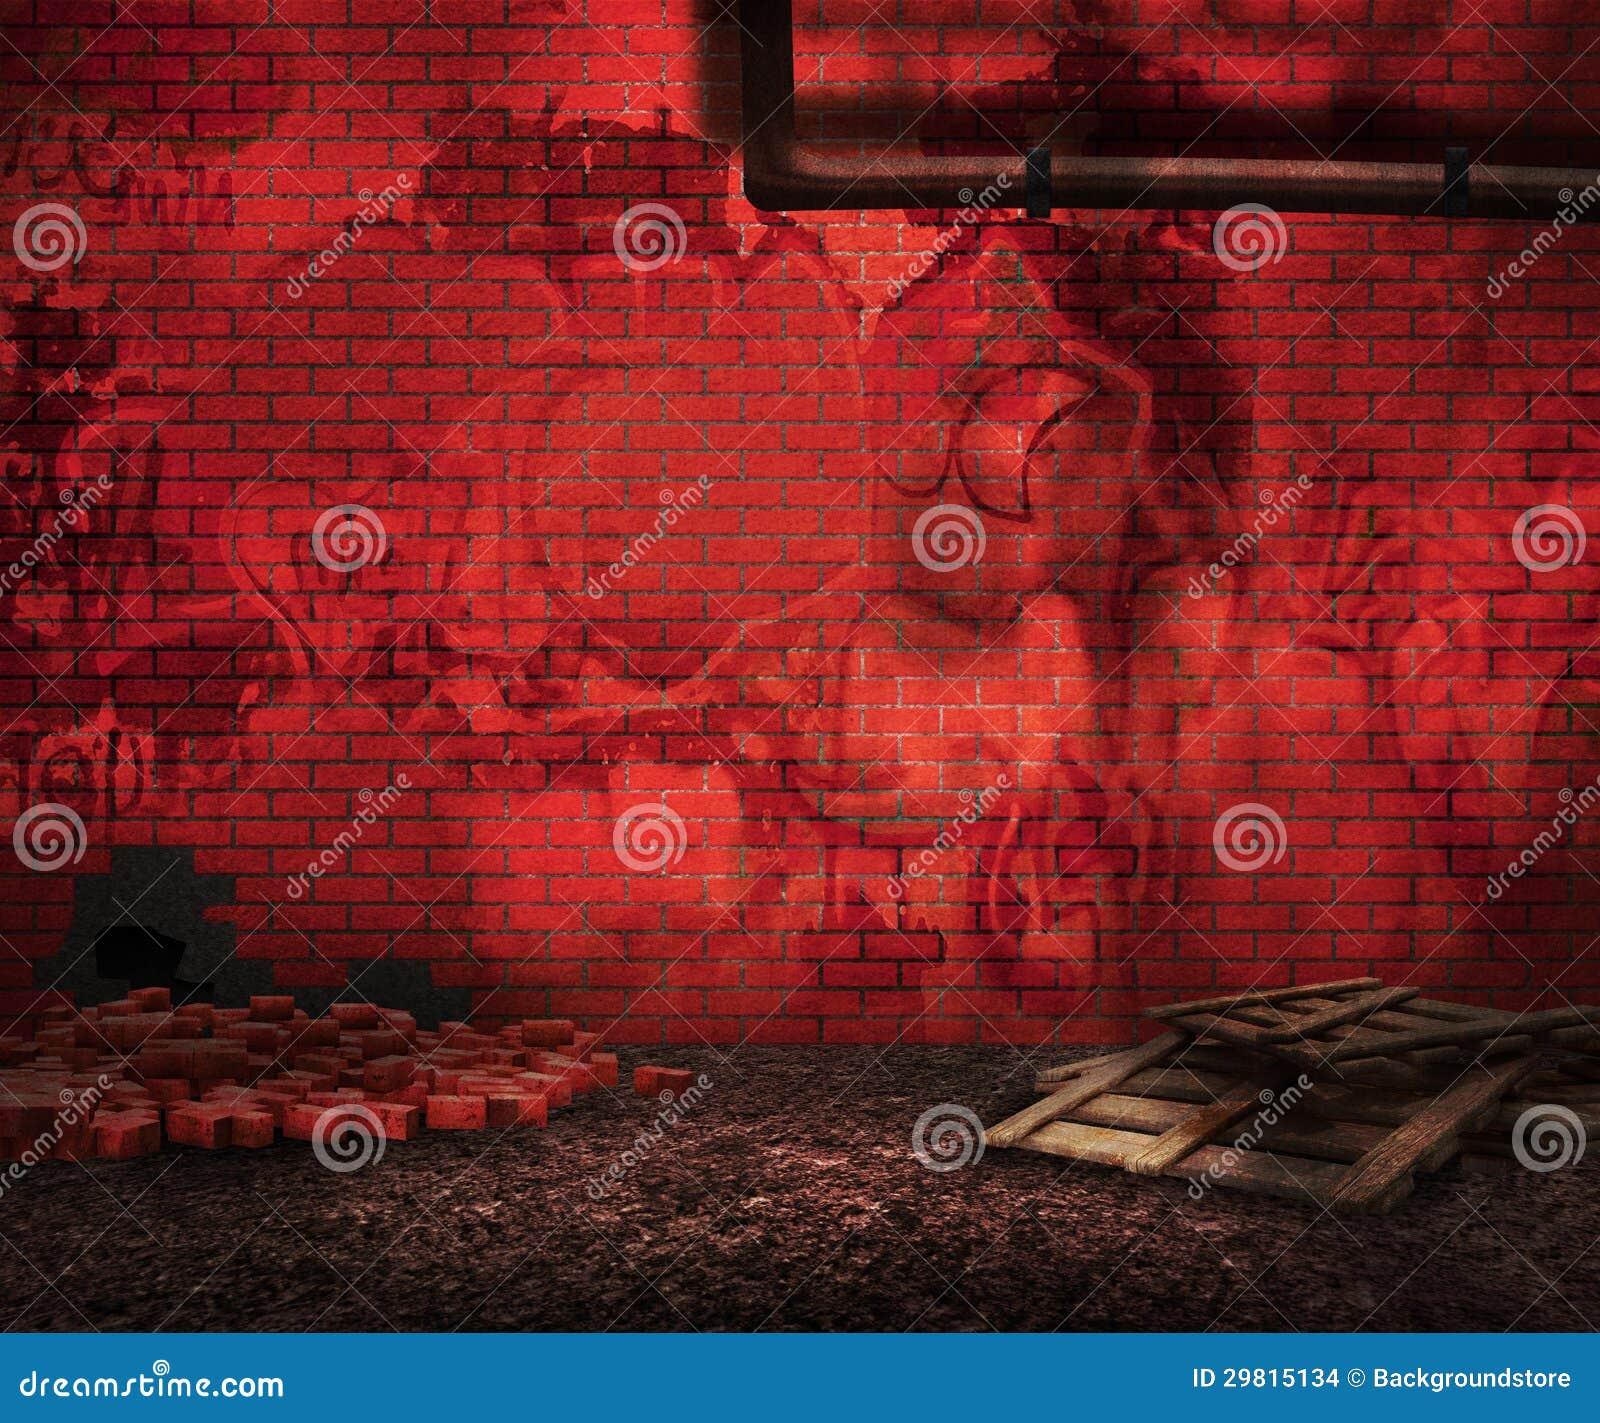 Backyard Background Images : Red Grunge Brick Backyard Background Stock Images  Image 29815134